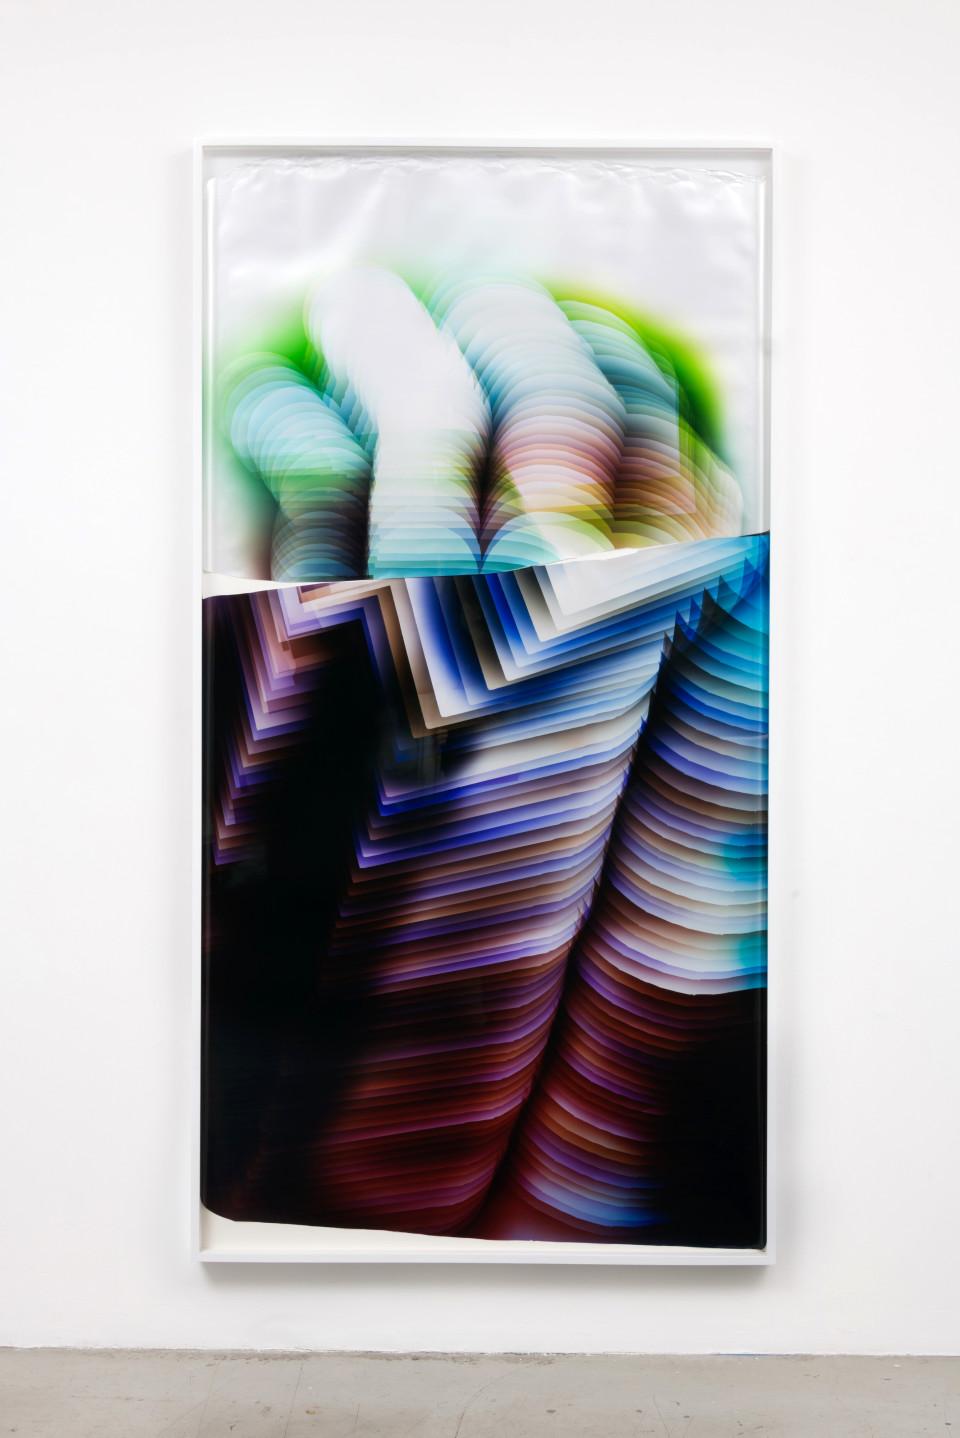 Image: Mariah Robertson  257 258, 2017  unique chromogenic print  94 x 49 inches (238.8 x 124.5 cm)